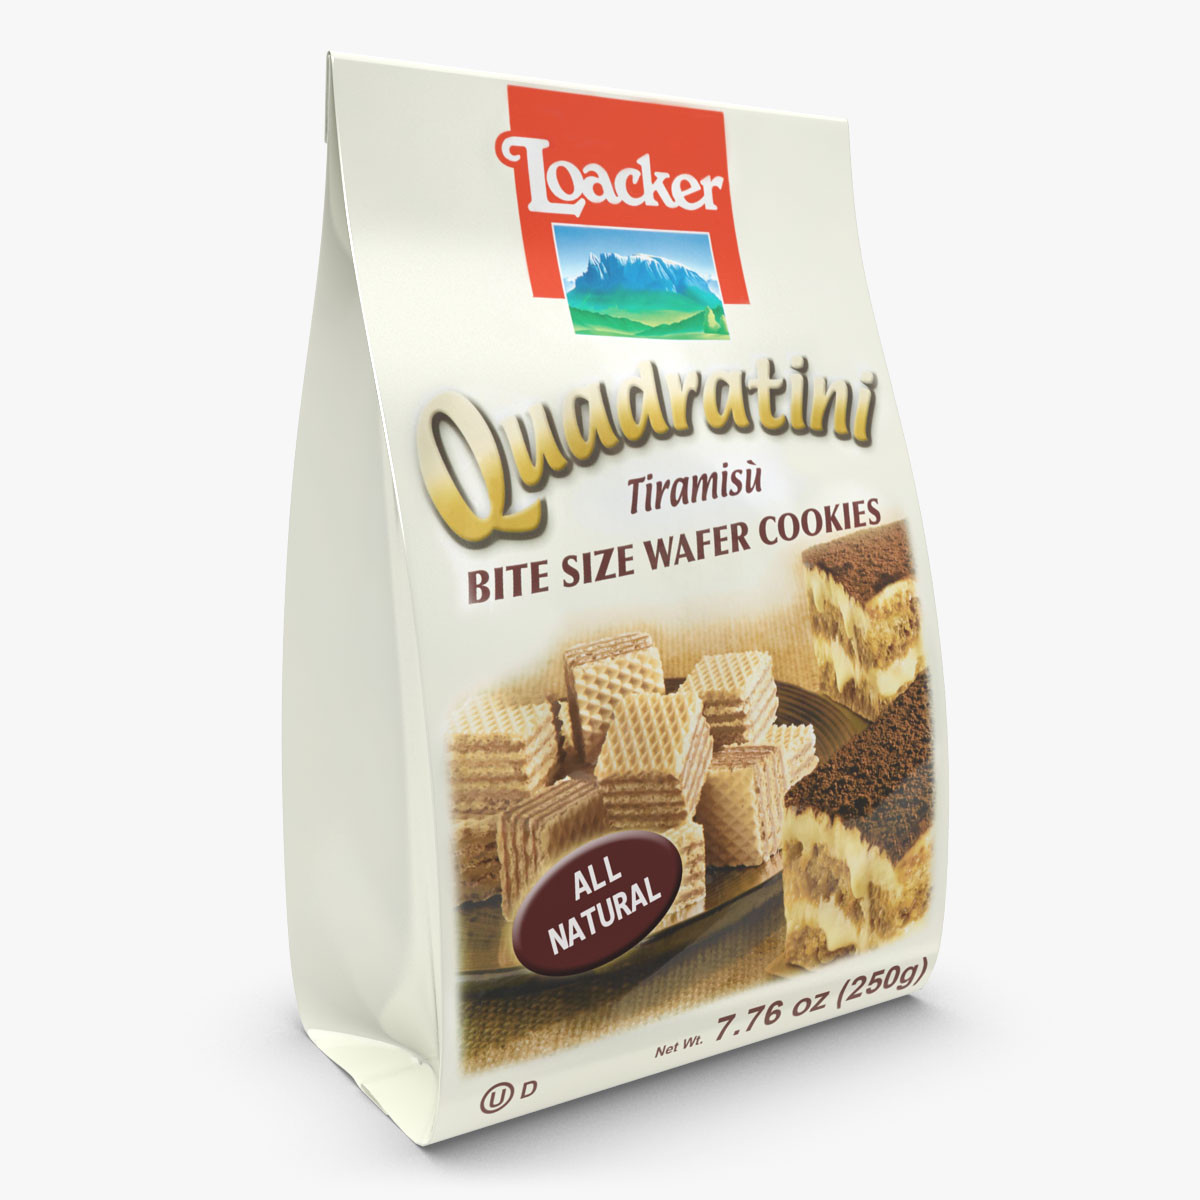 Loacker Quadratini Tiramisu Wafer Cookies